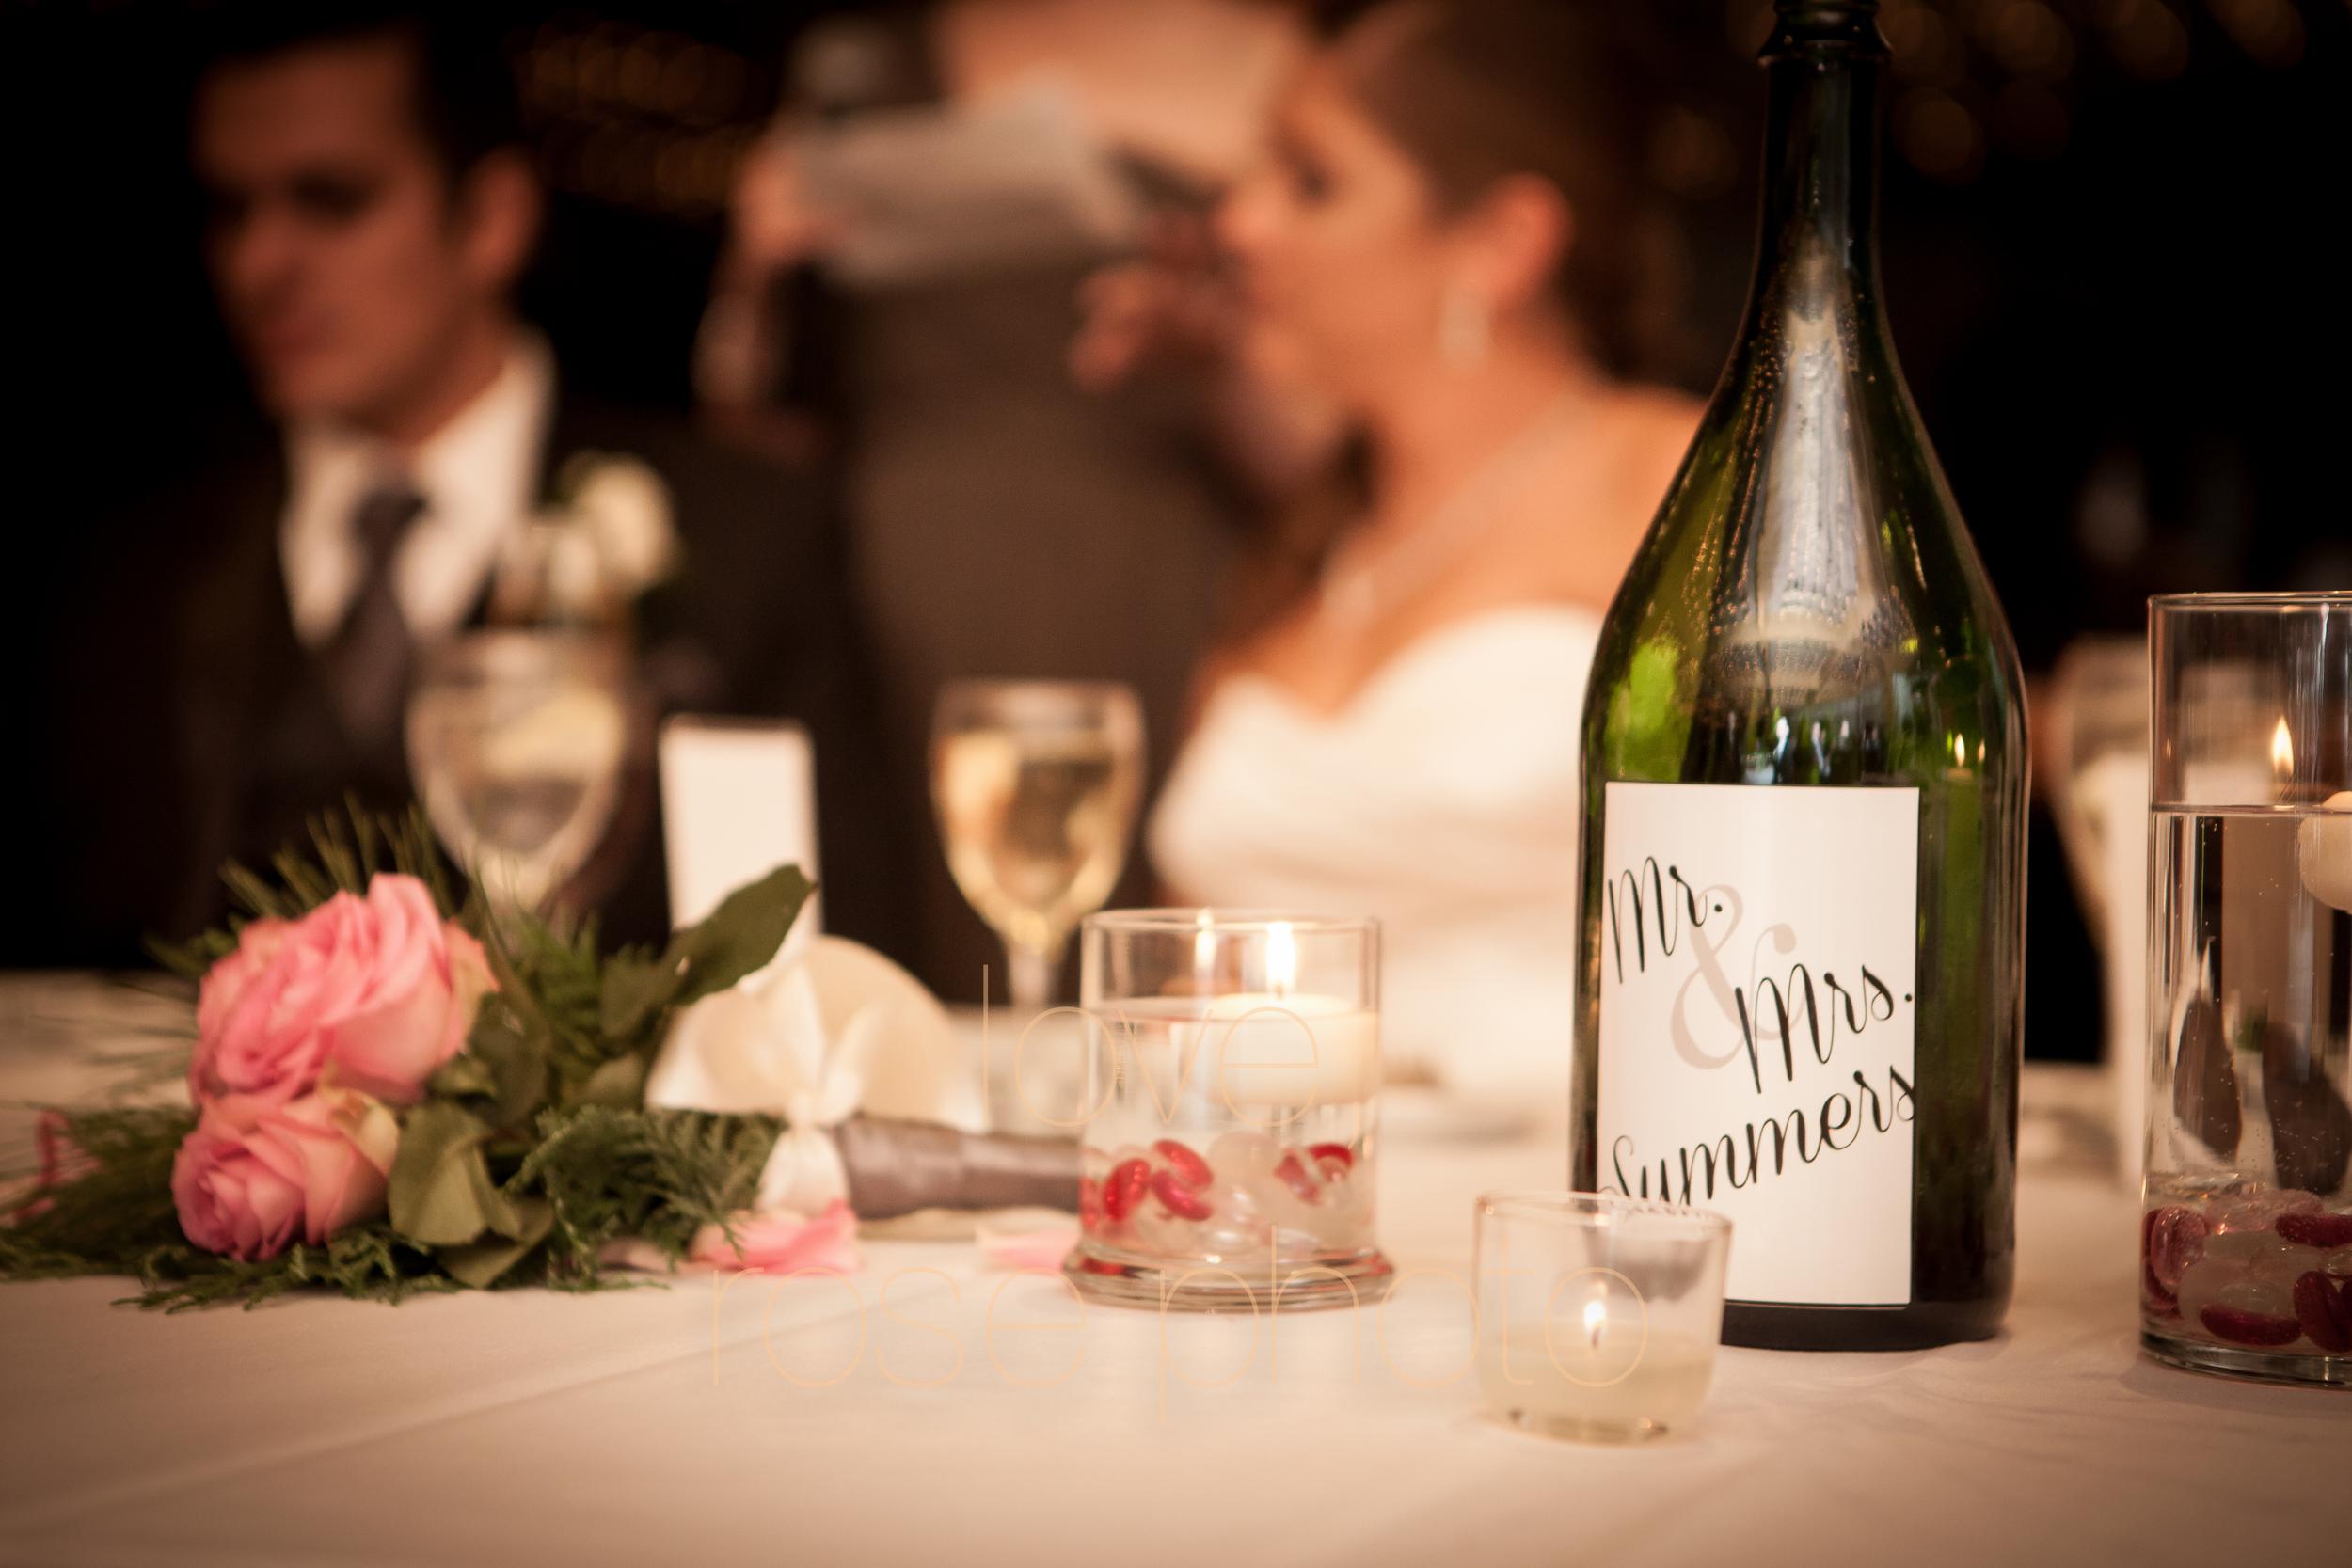 katie + even new years eve chicago oak brook mcdonalds lodge 2014 polish wedding balloon drop champagne-012.jpg